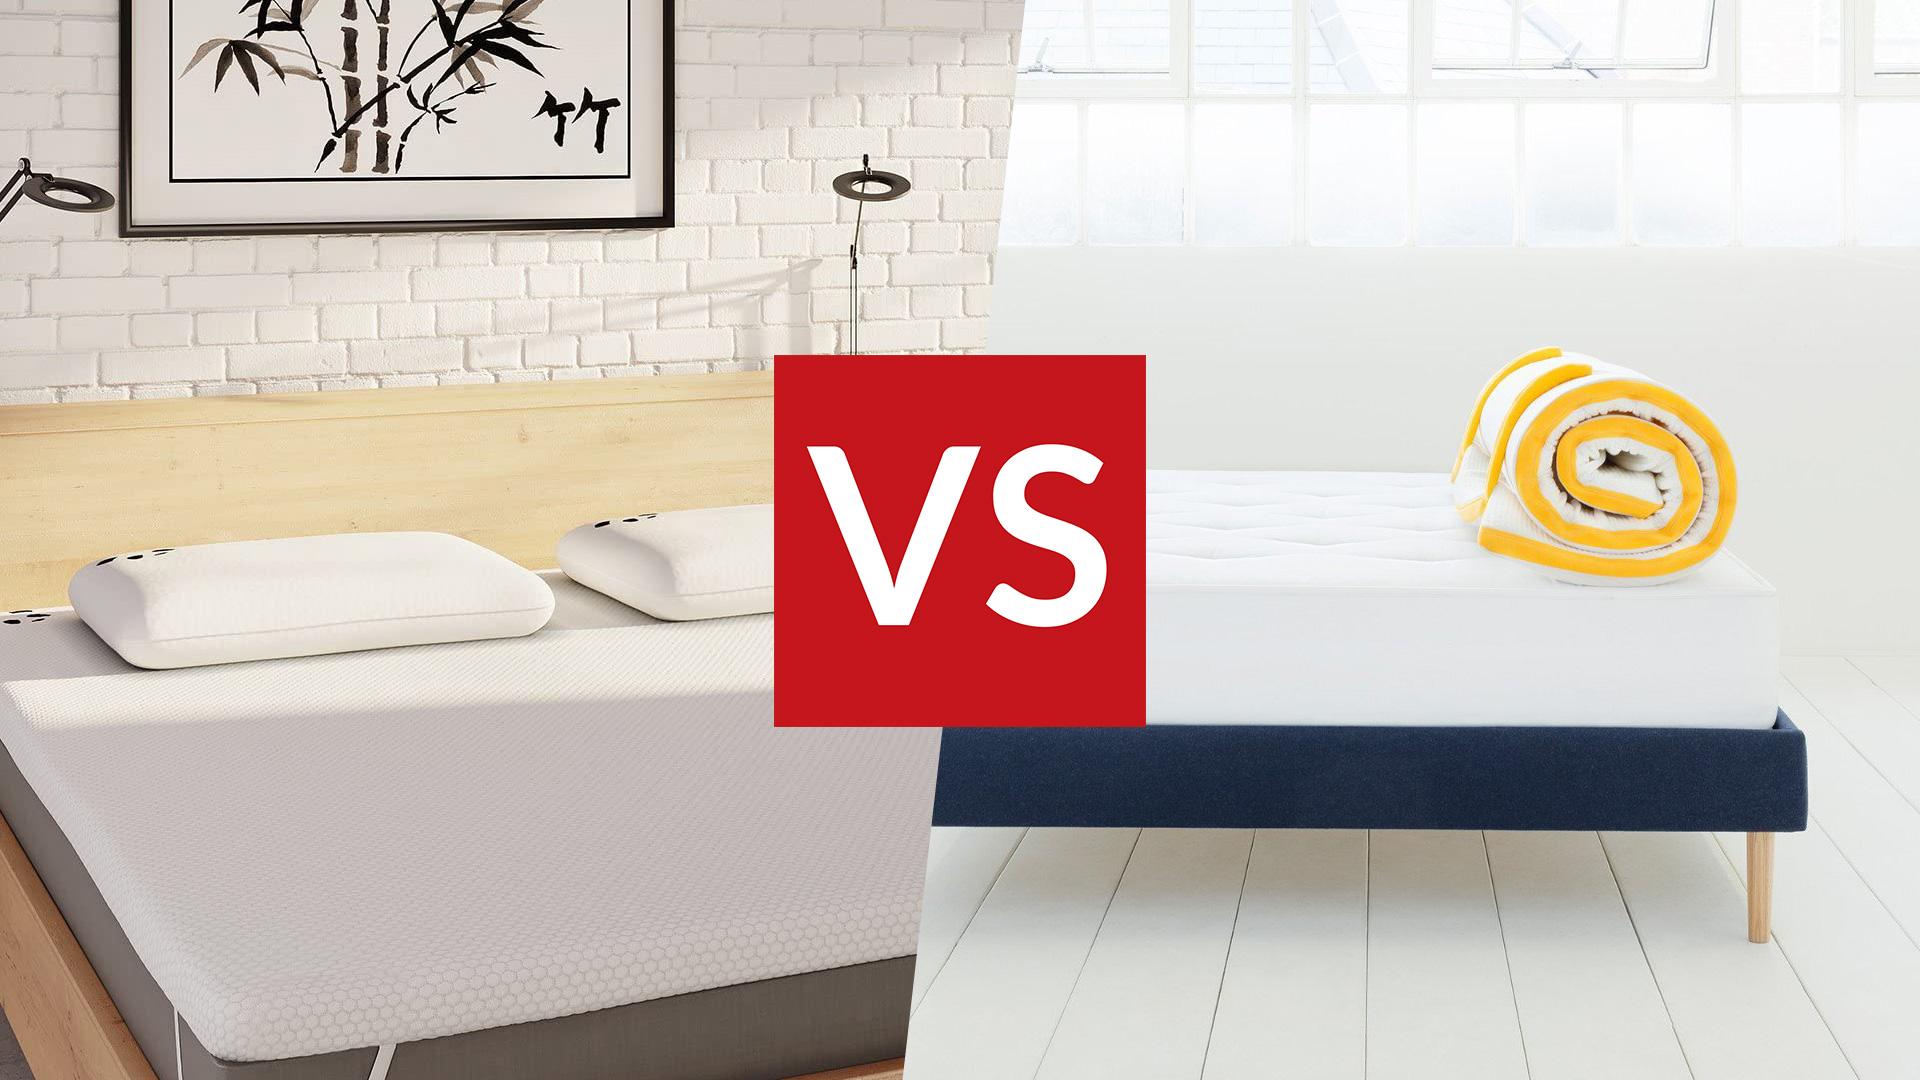 eve topper vs panda topper which